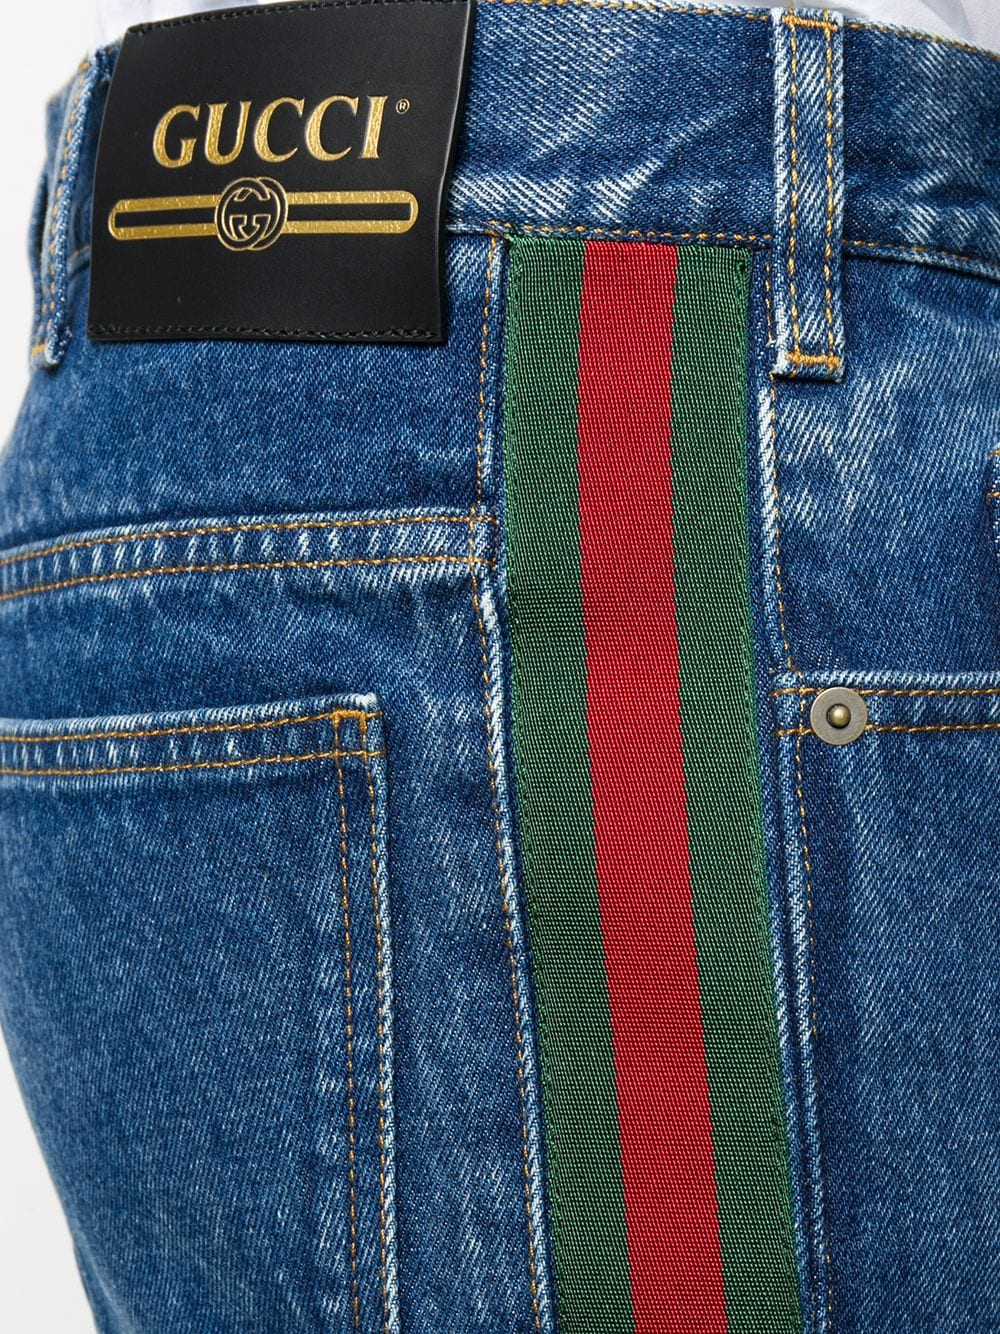 blue cotton Sylvie bootcut jeans featuring Gucci Web detail GUCCI |  | 623954-XDA9B4447